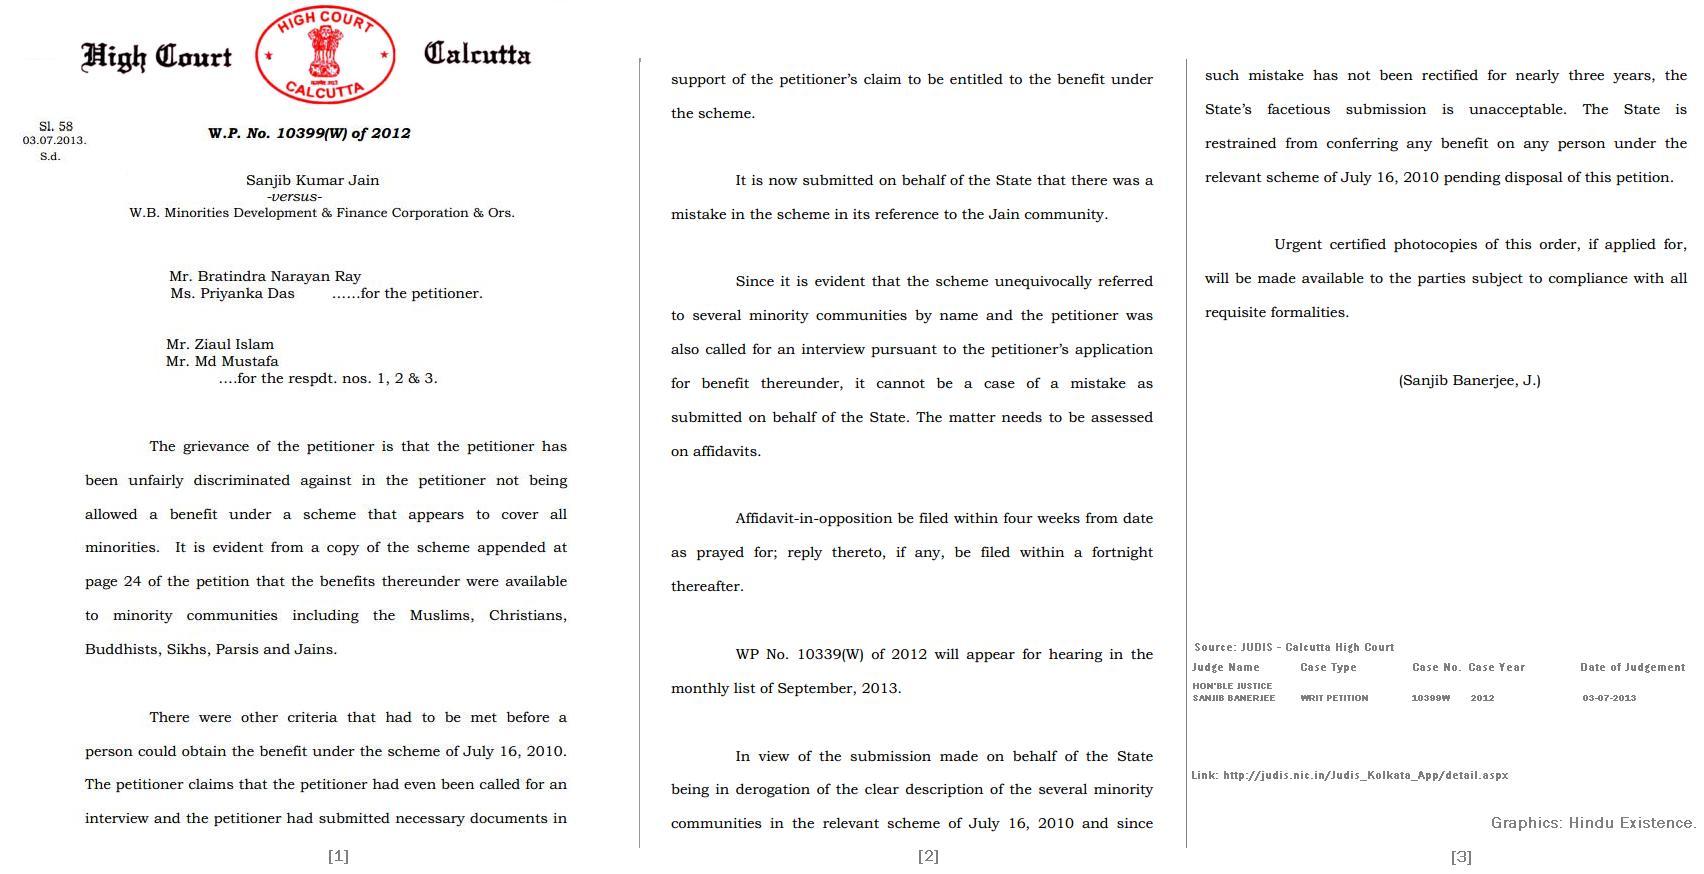 jainism vs sikhism 2 essay View essay - week 2 jainism vs sikhism from rel133 133 at university of phoenix.